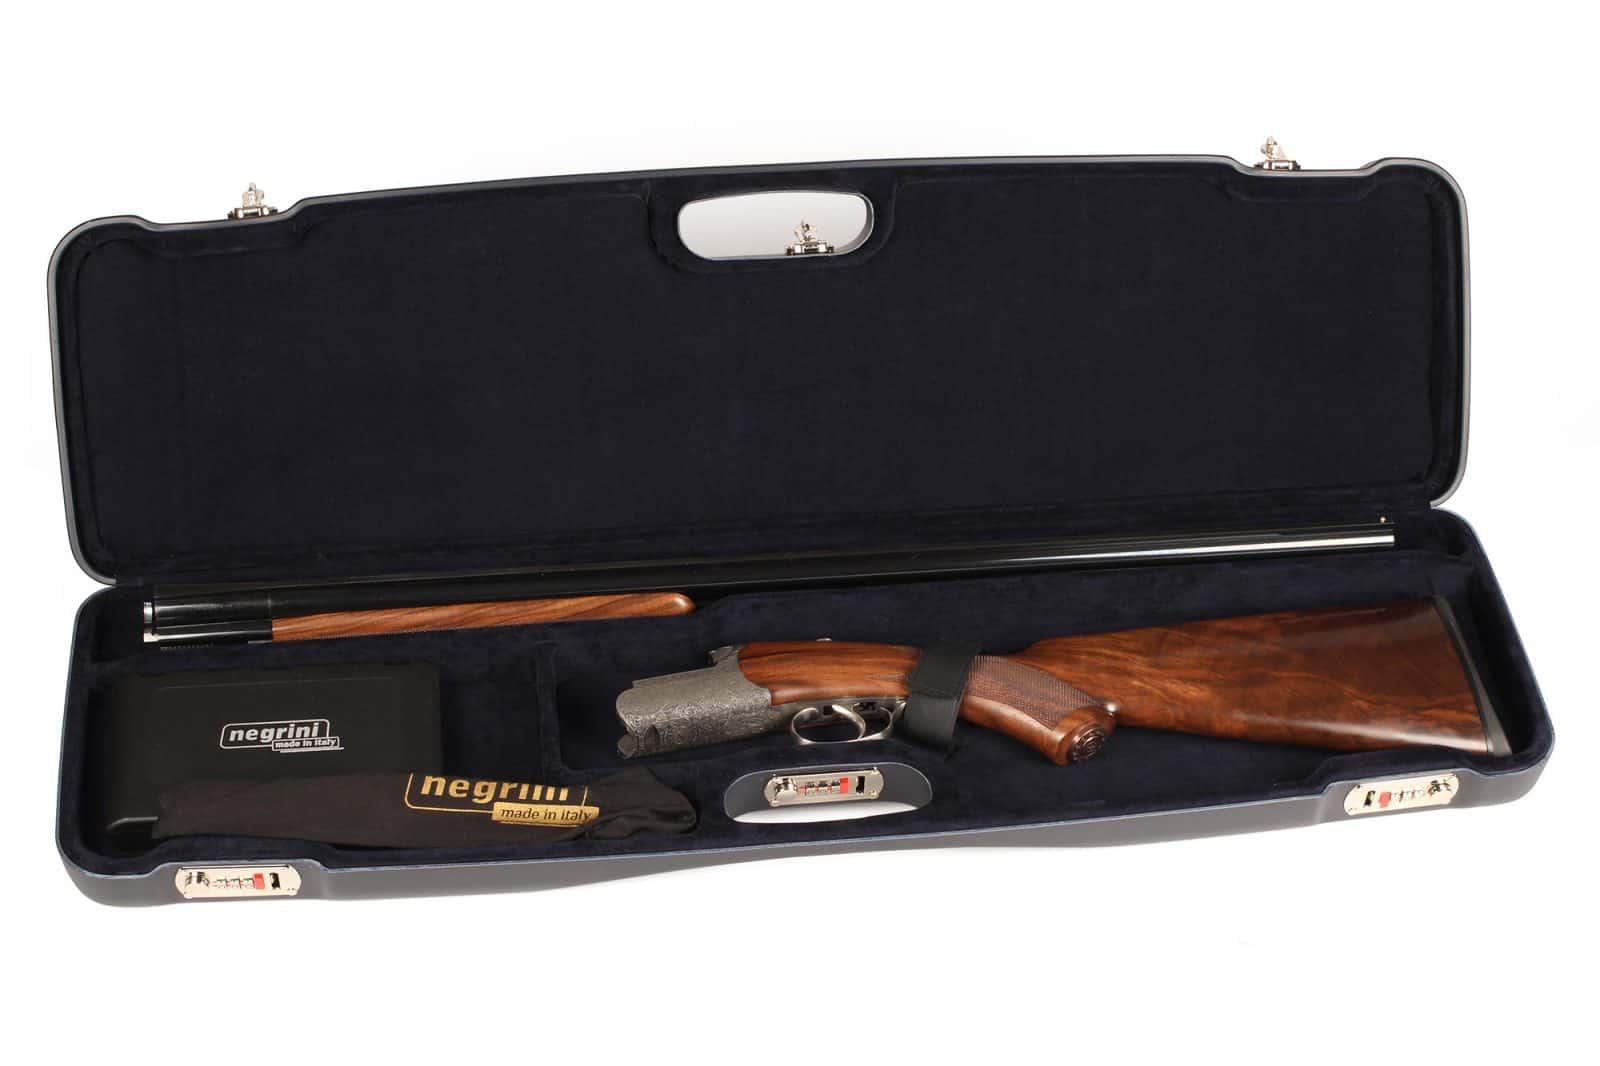 Negrini OU/SxS Shotgun Travel Case – 1602LR/5516